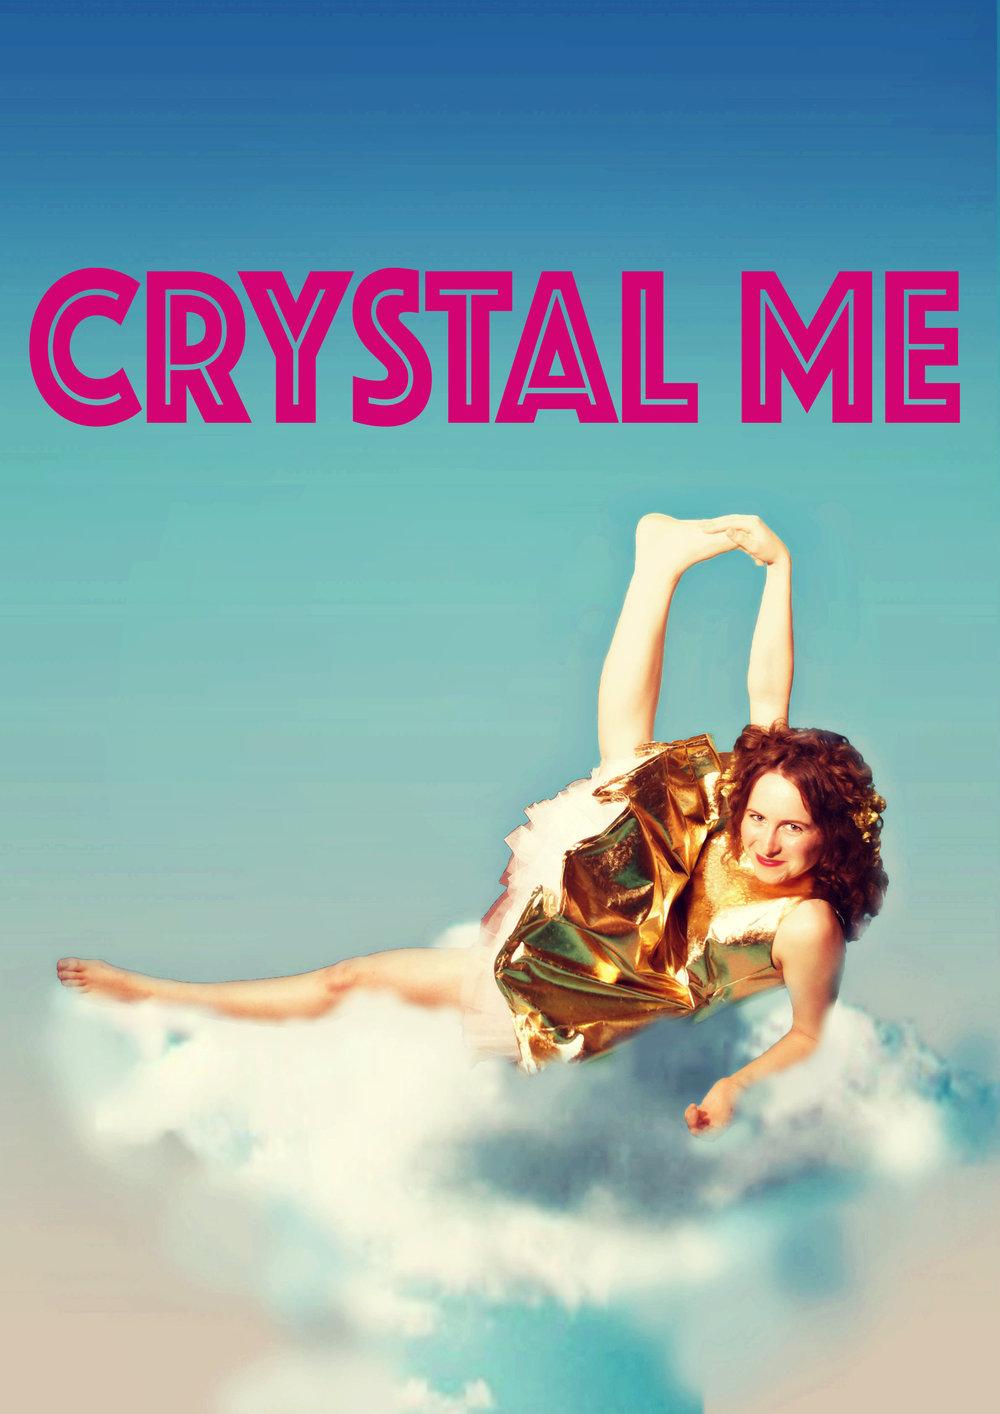 CrystalMePoster copy 2.jpg